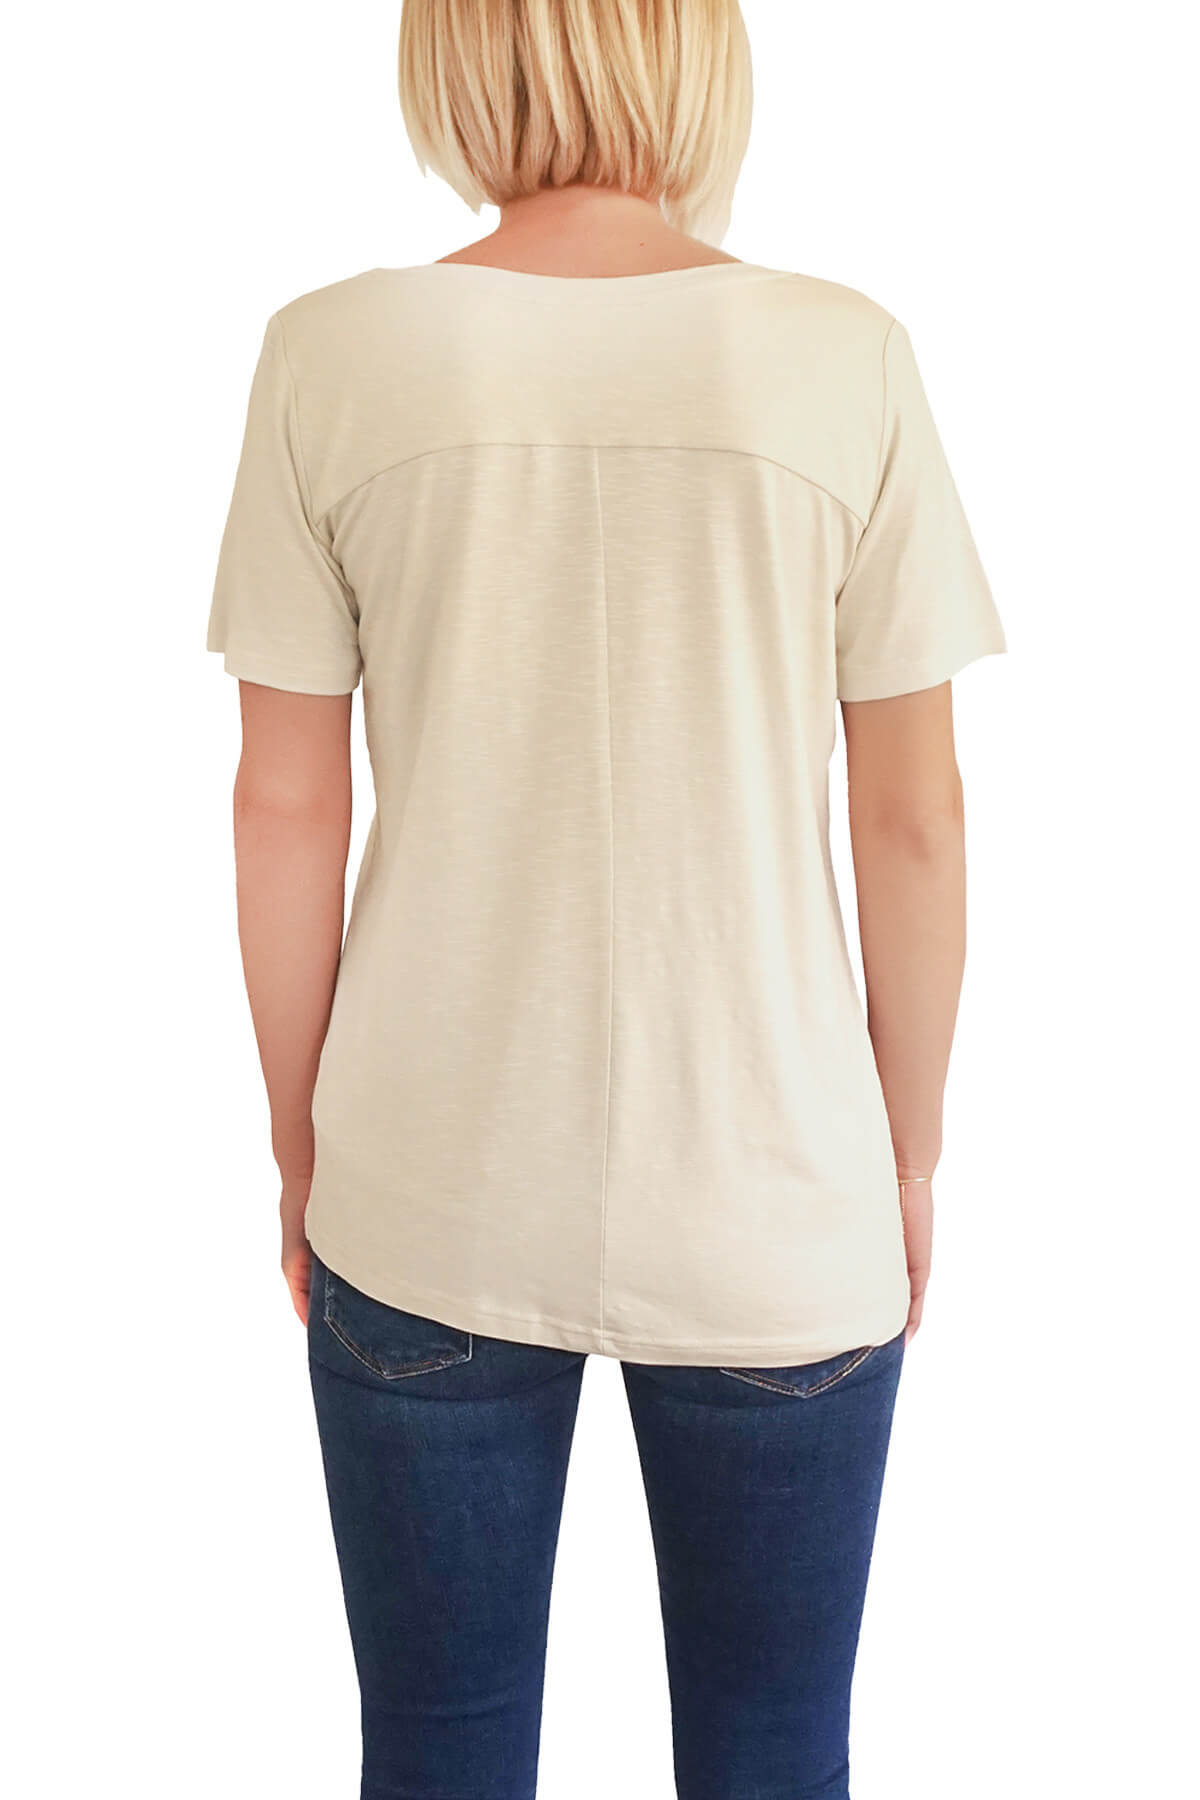 MOF Kadın Taş T-Shirt VYCT-T 2